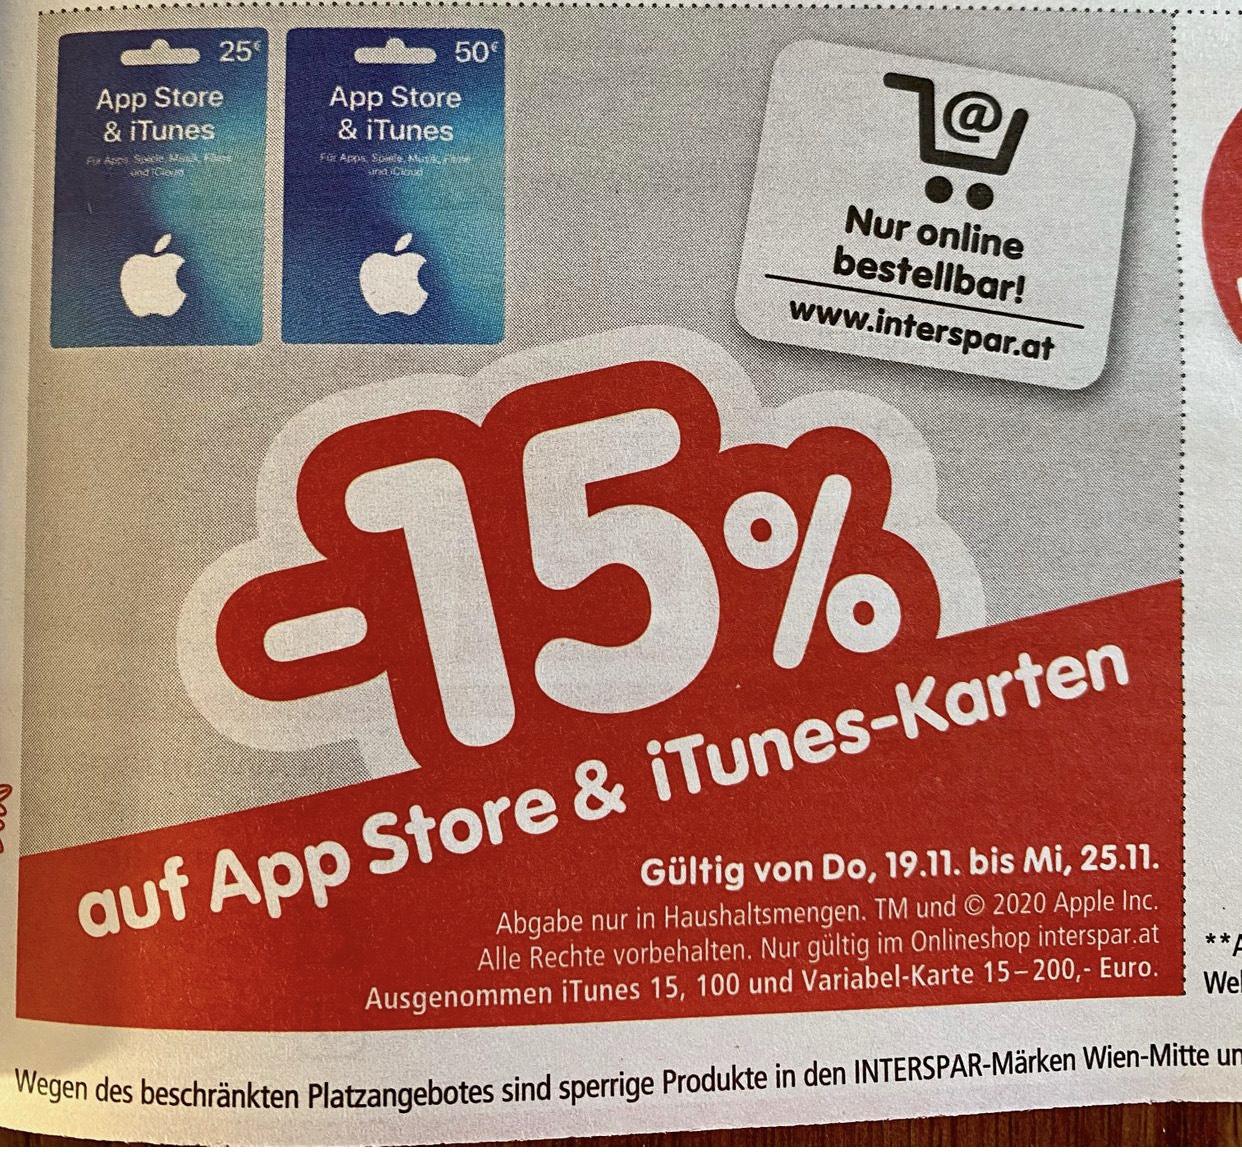 Interspar Onlineshop Itunes Karten -15%